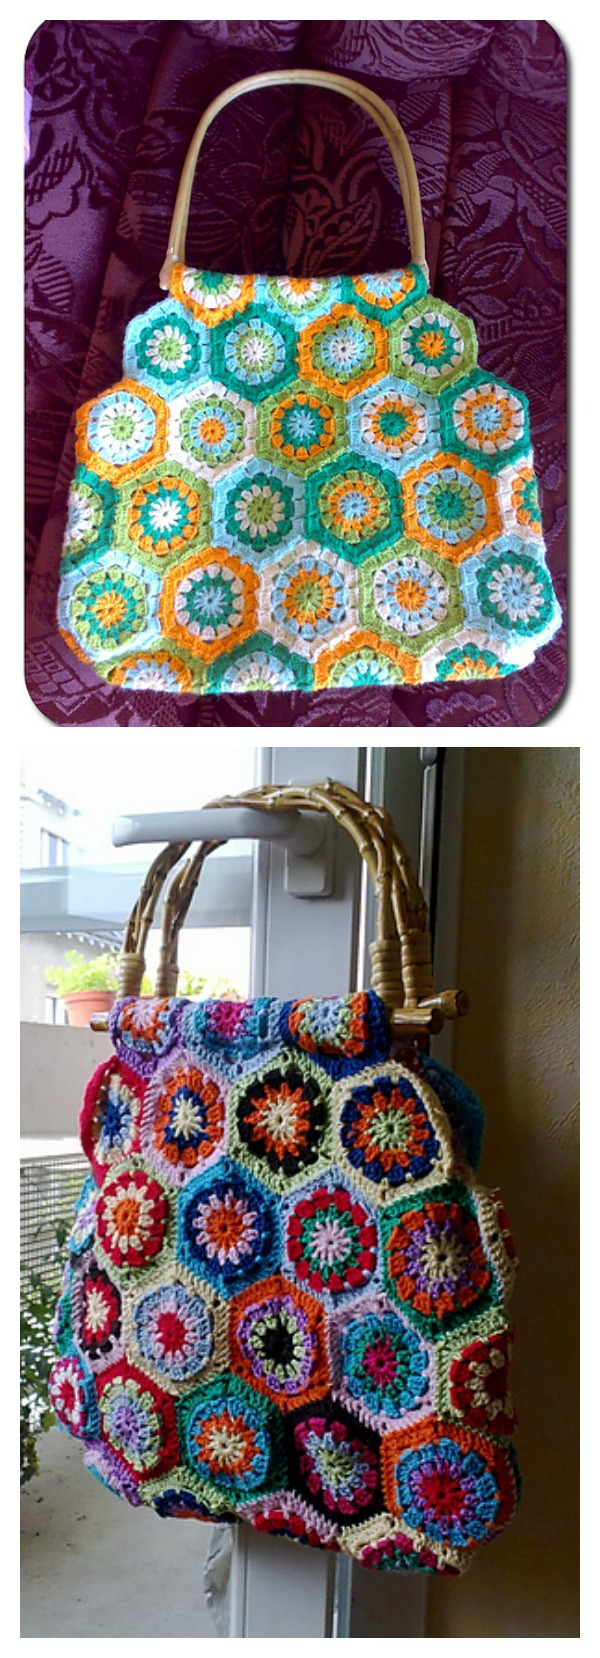 Crochet Grab Bag Pattern : 8 Mothers Day Gift Free Crochet Patterns